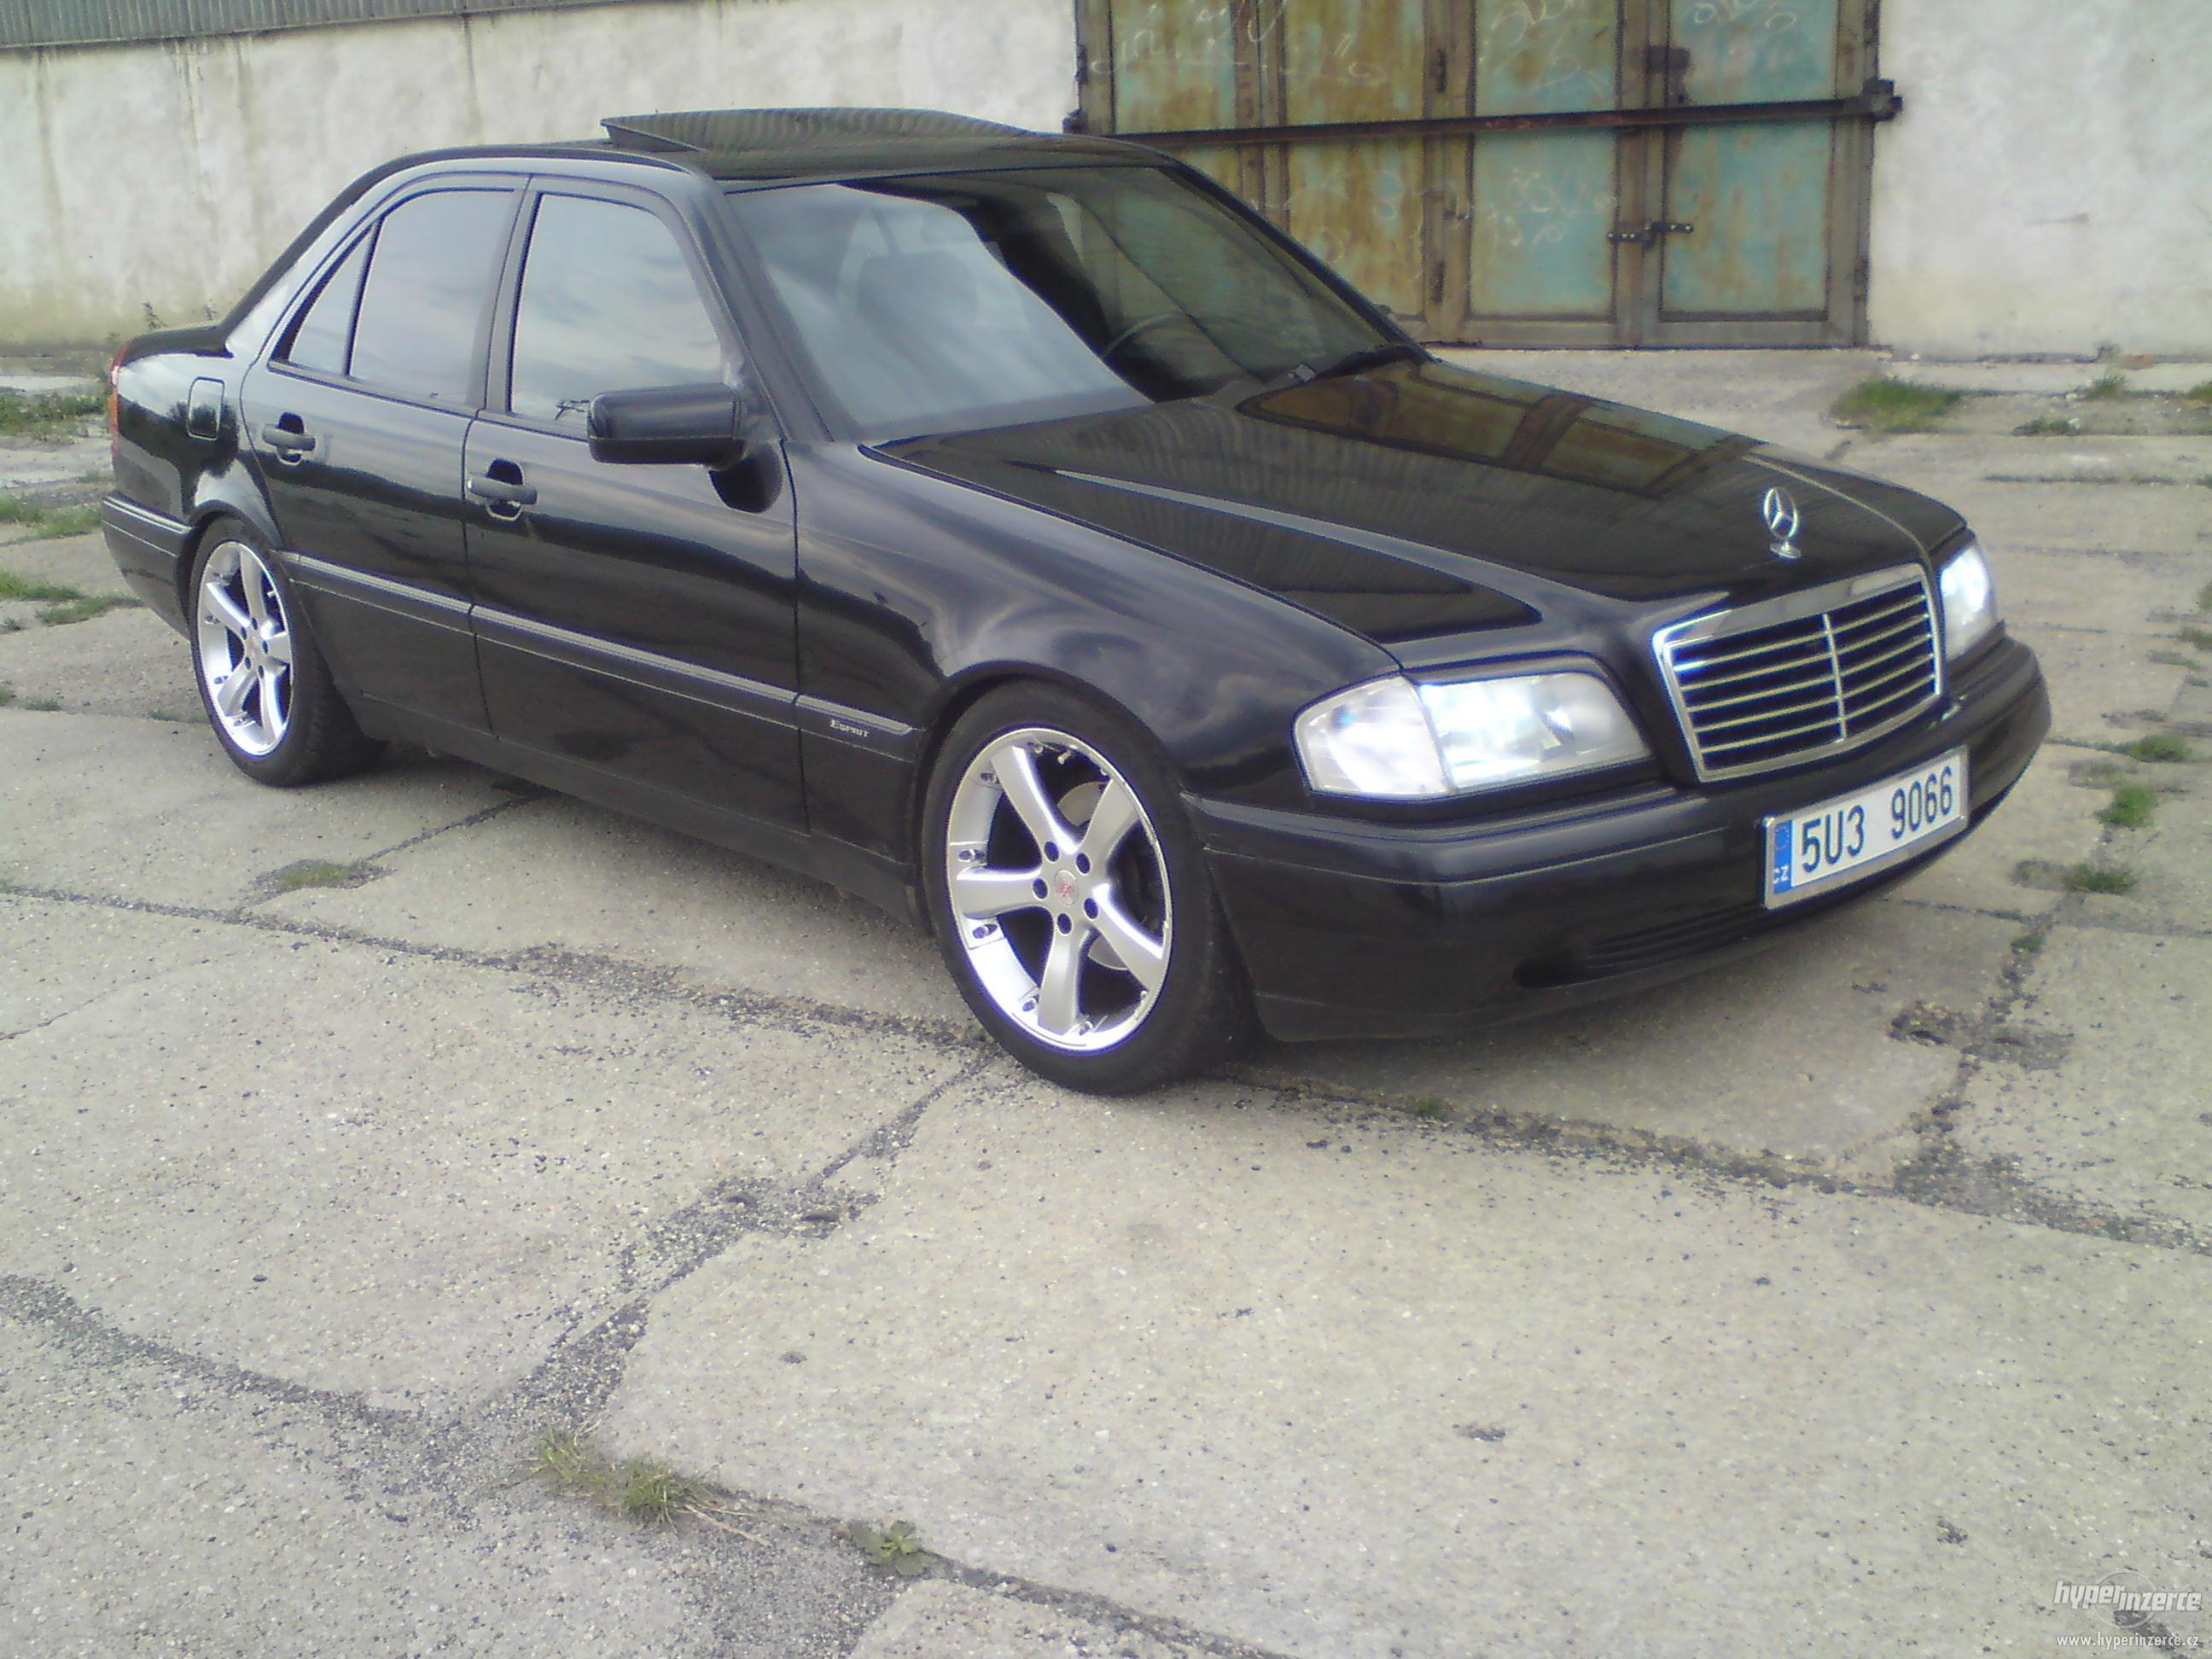 Mercedes benz c180 esprit photos reviews news specs for Buy my mercedes benz